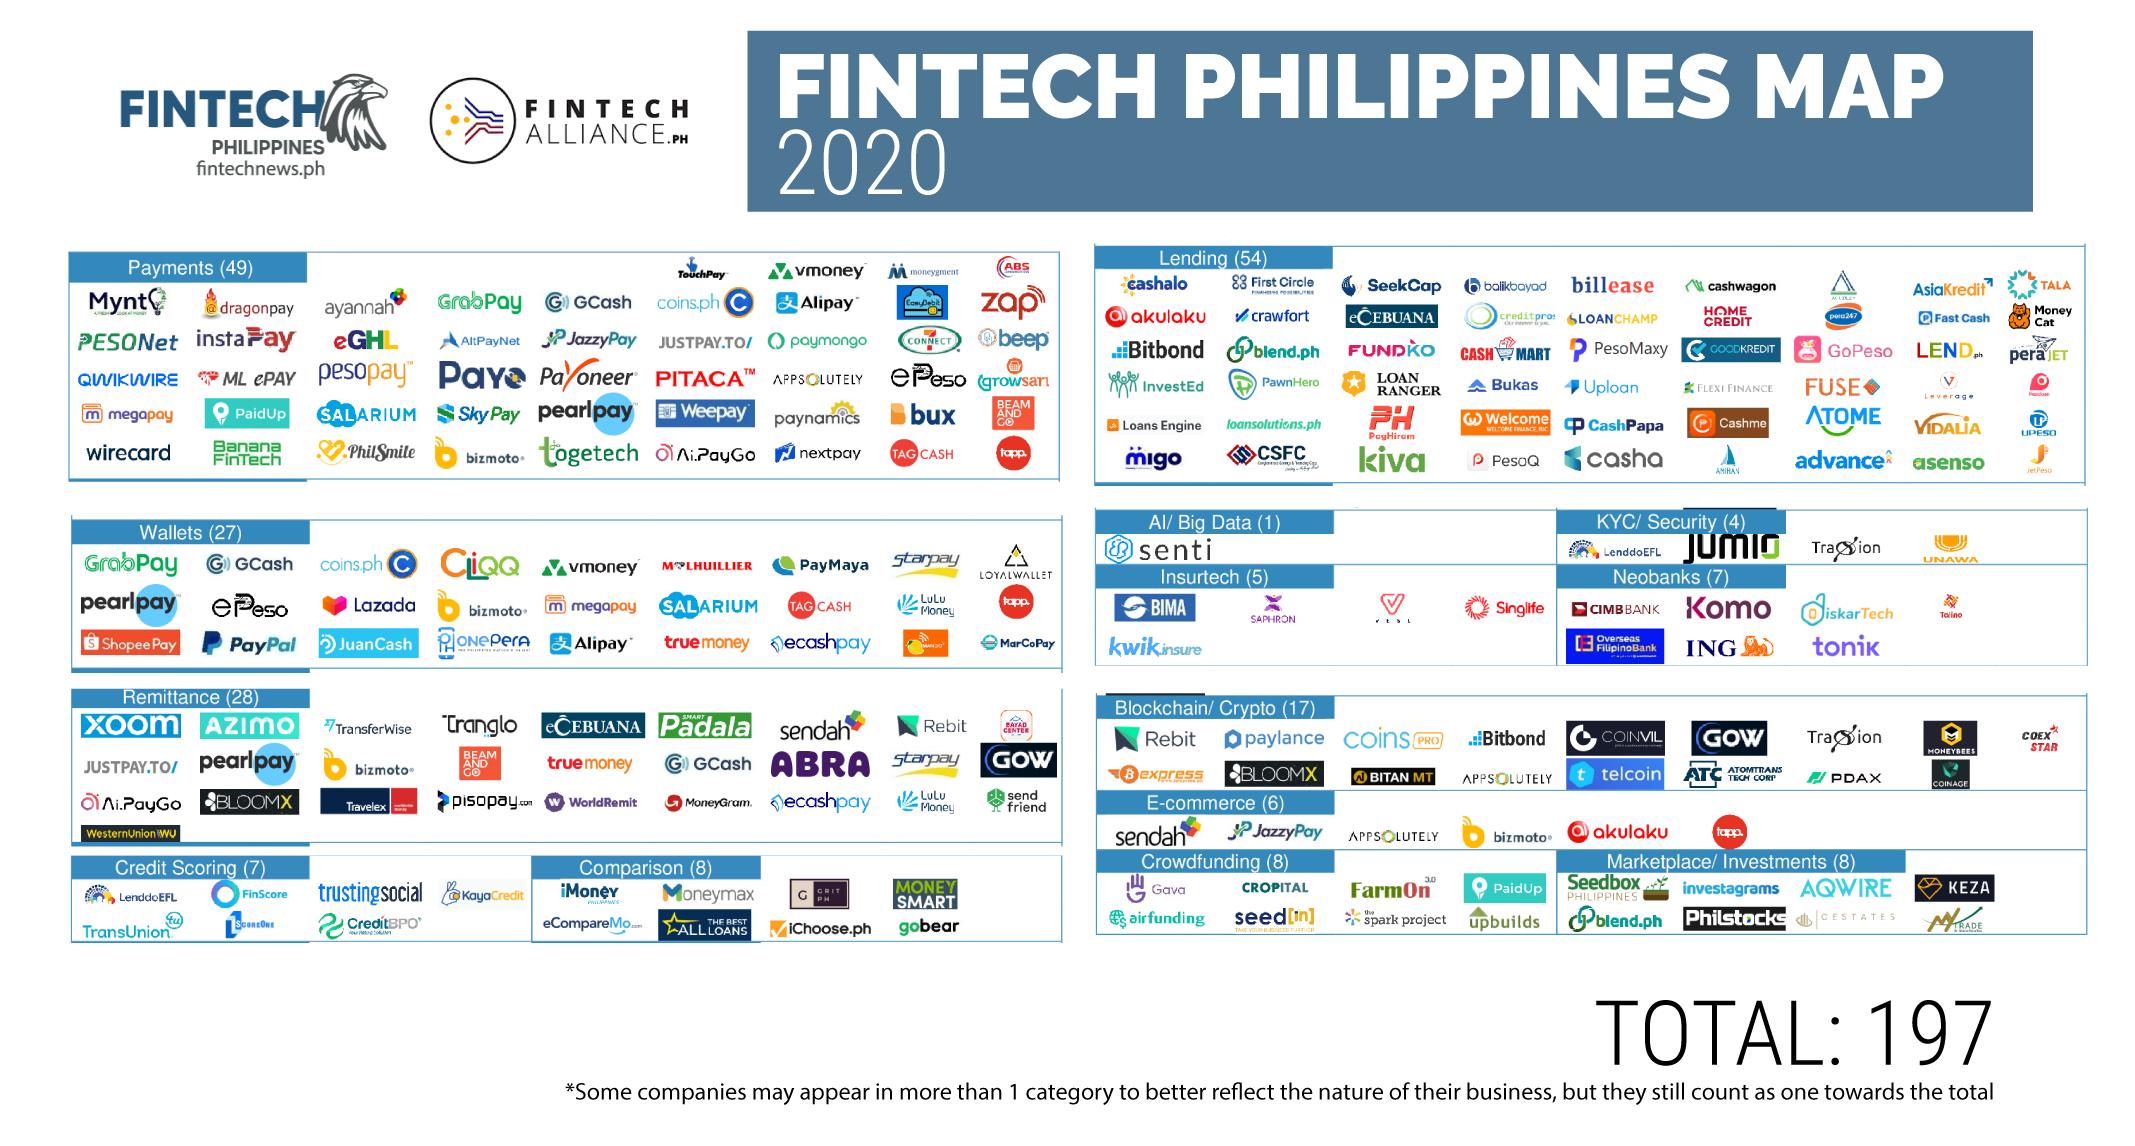 Philippines Fintech Report 2020 - Fintech Philippines Map 2020